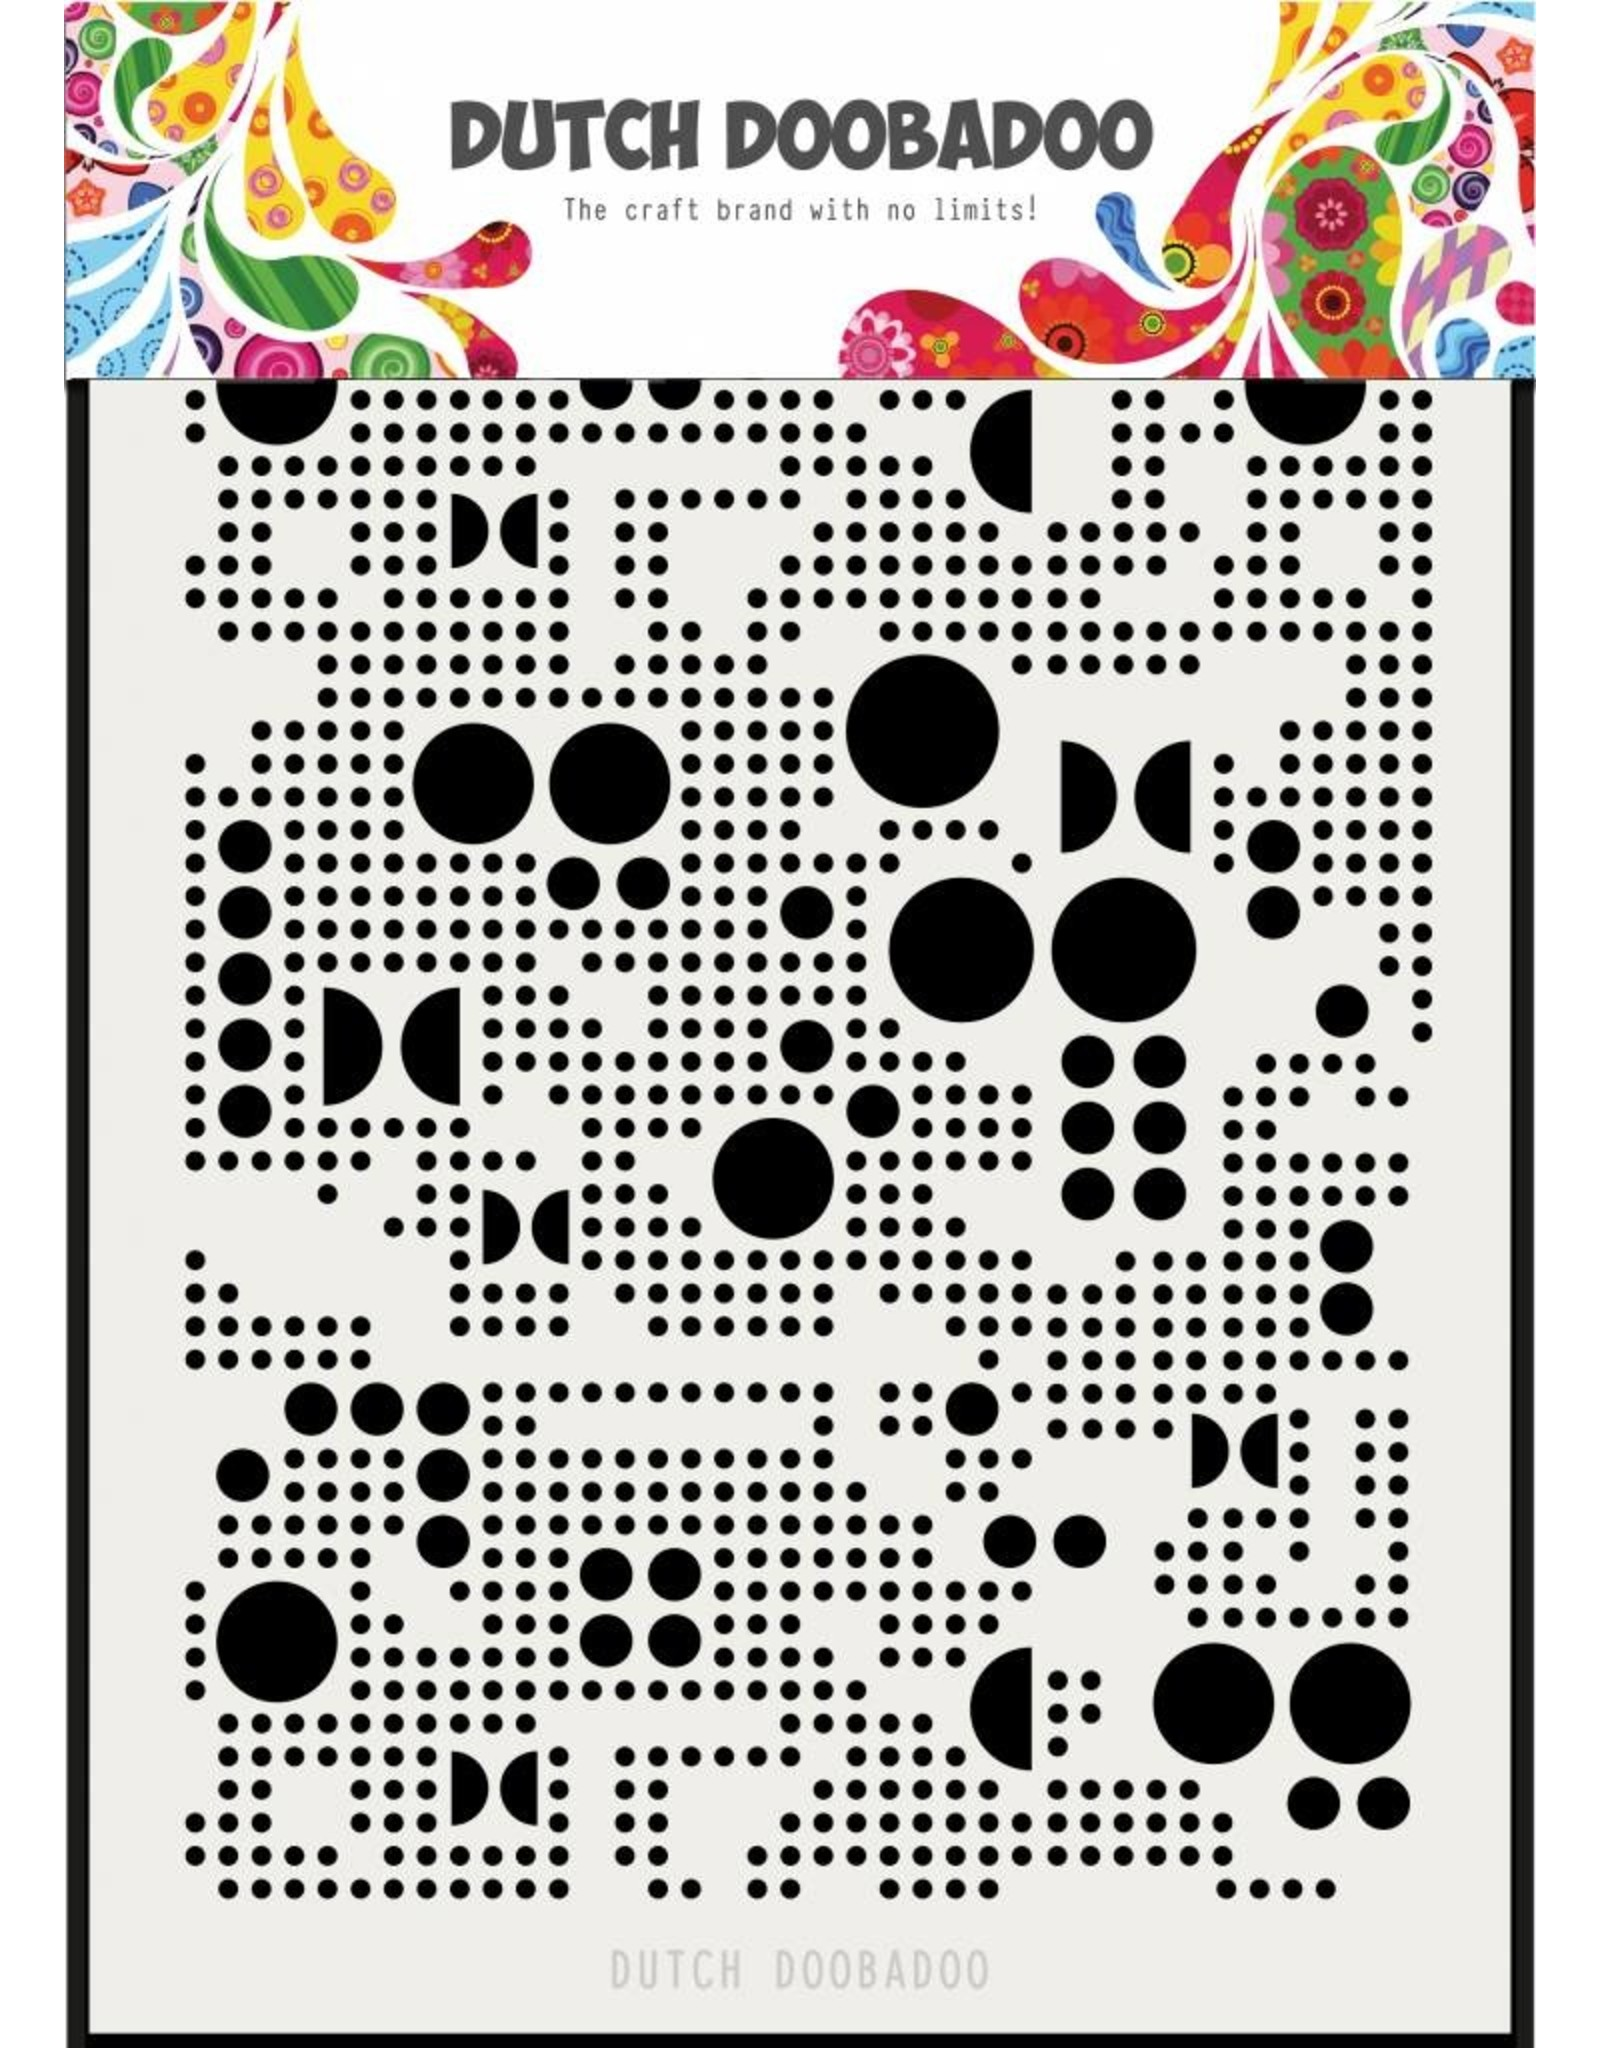 Dutch Doobadoo Dutch Mask Art Mylar Various Dots A5